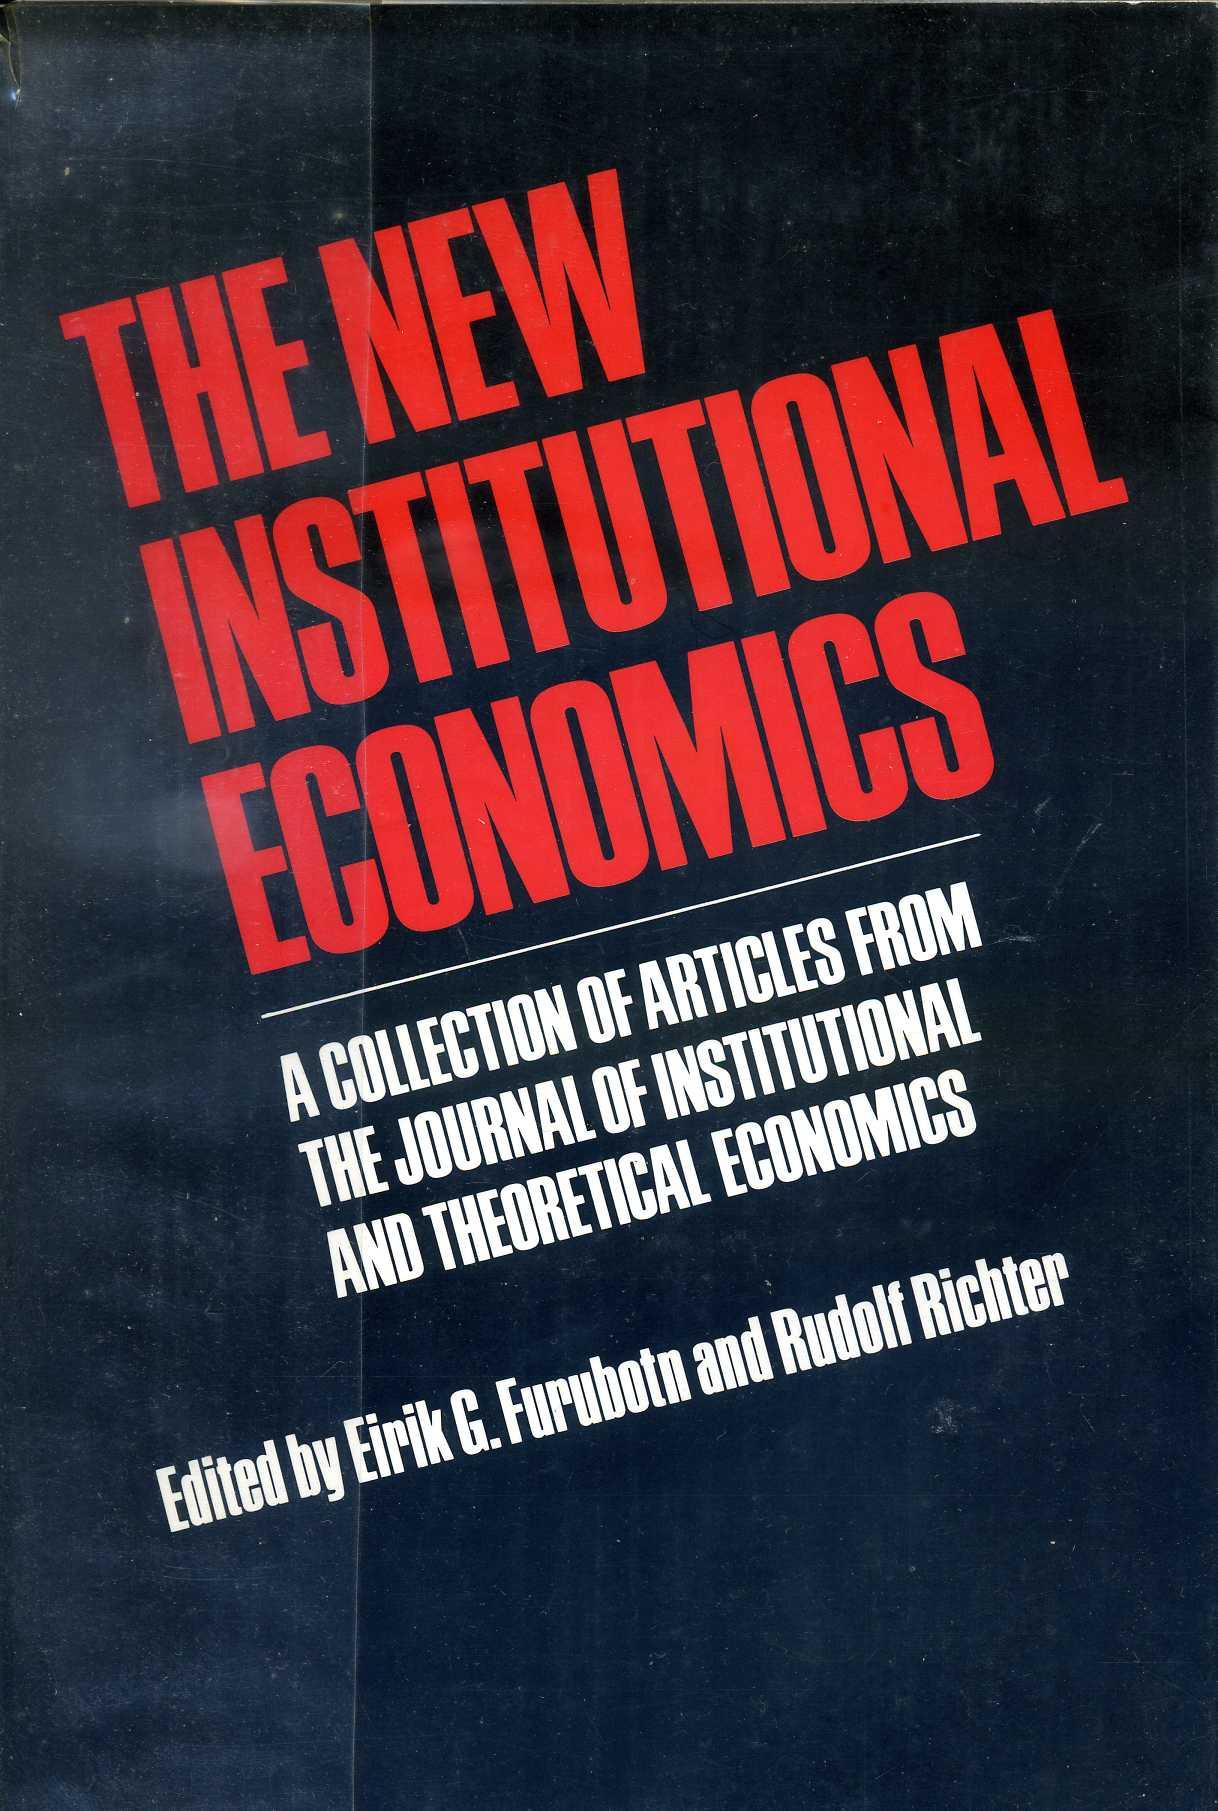 The New institutional economics